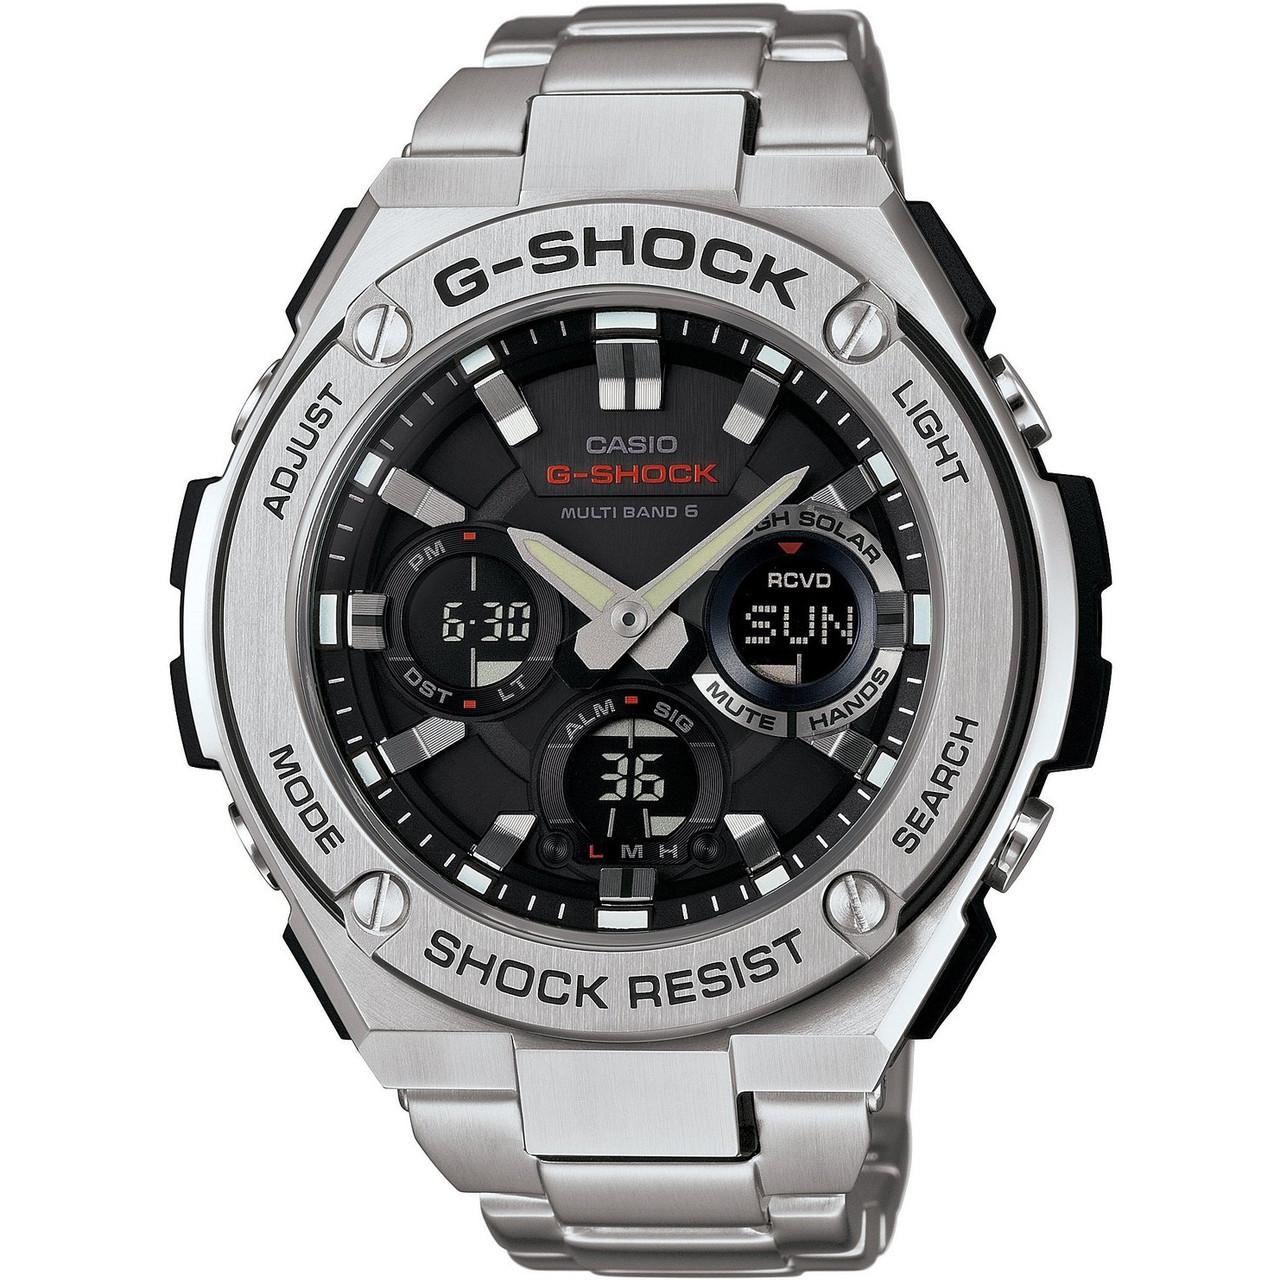 341e0660884919 G-Shock G-Steel Radio Controlled Solar Powered Watch GST-W110D-1AER